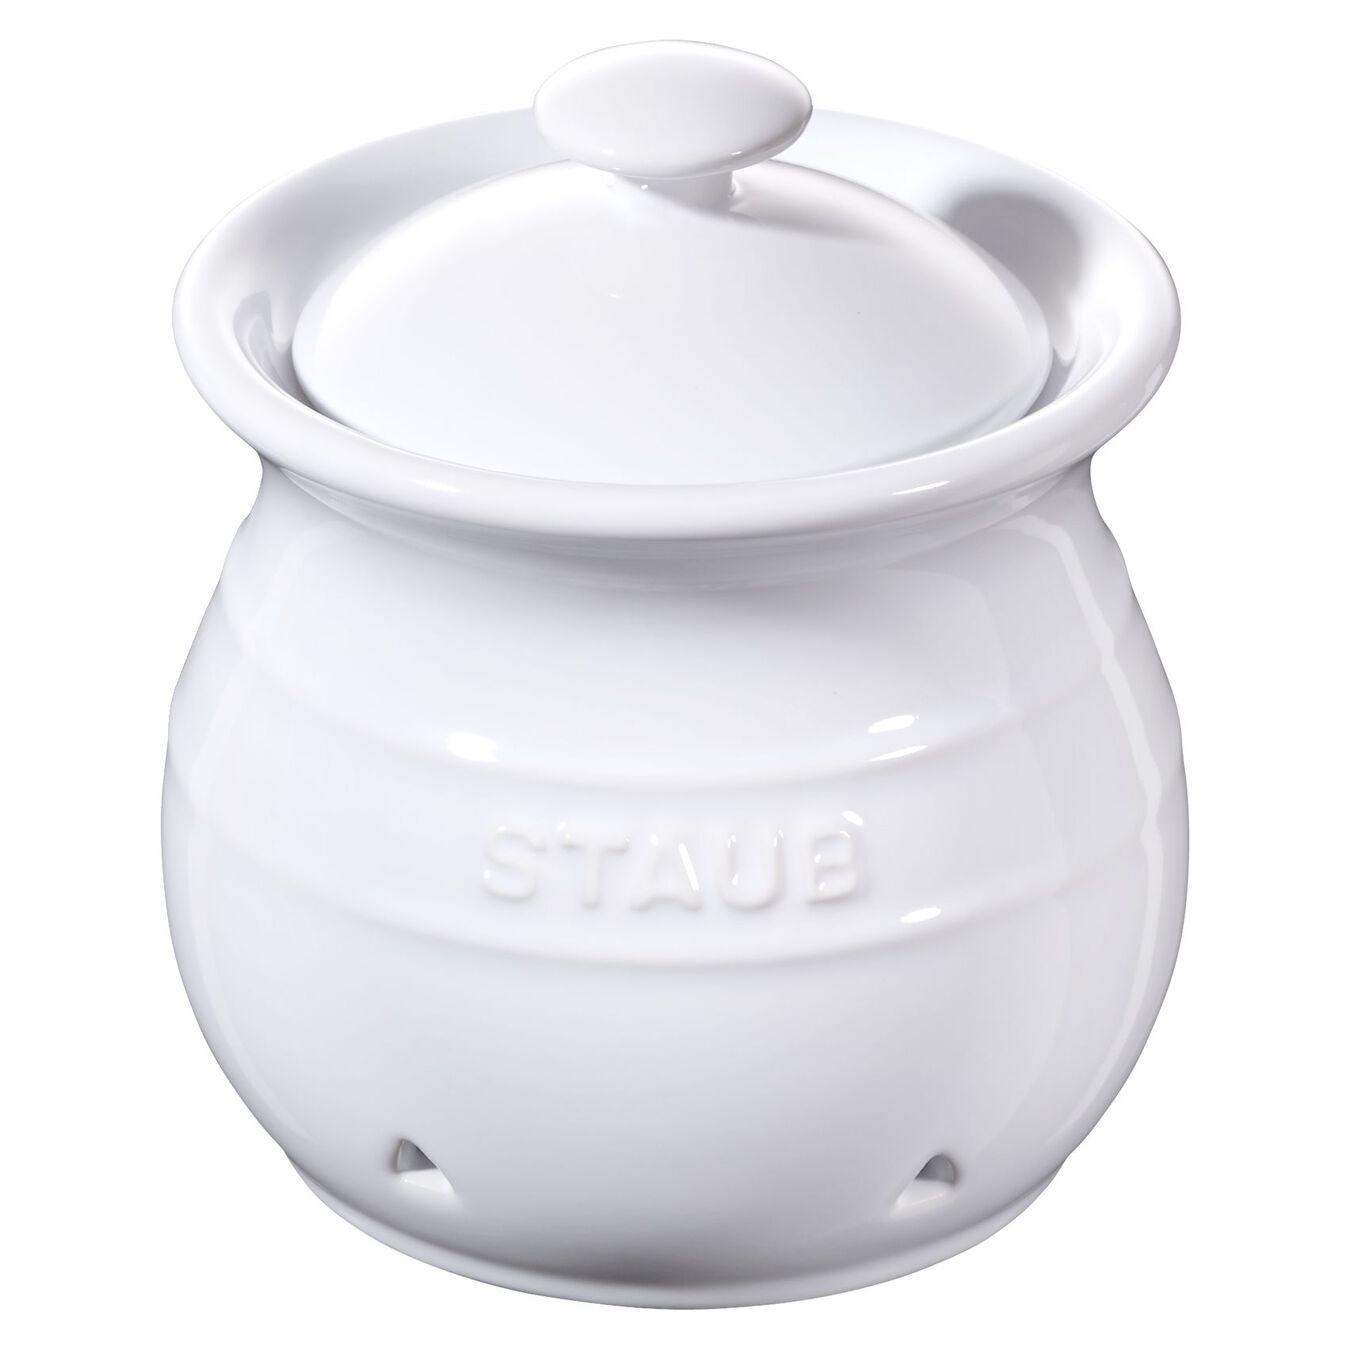 10 cm Ceramic Pot à ail, Pure-White,,large 1